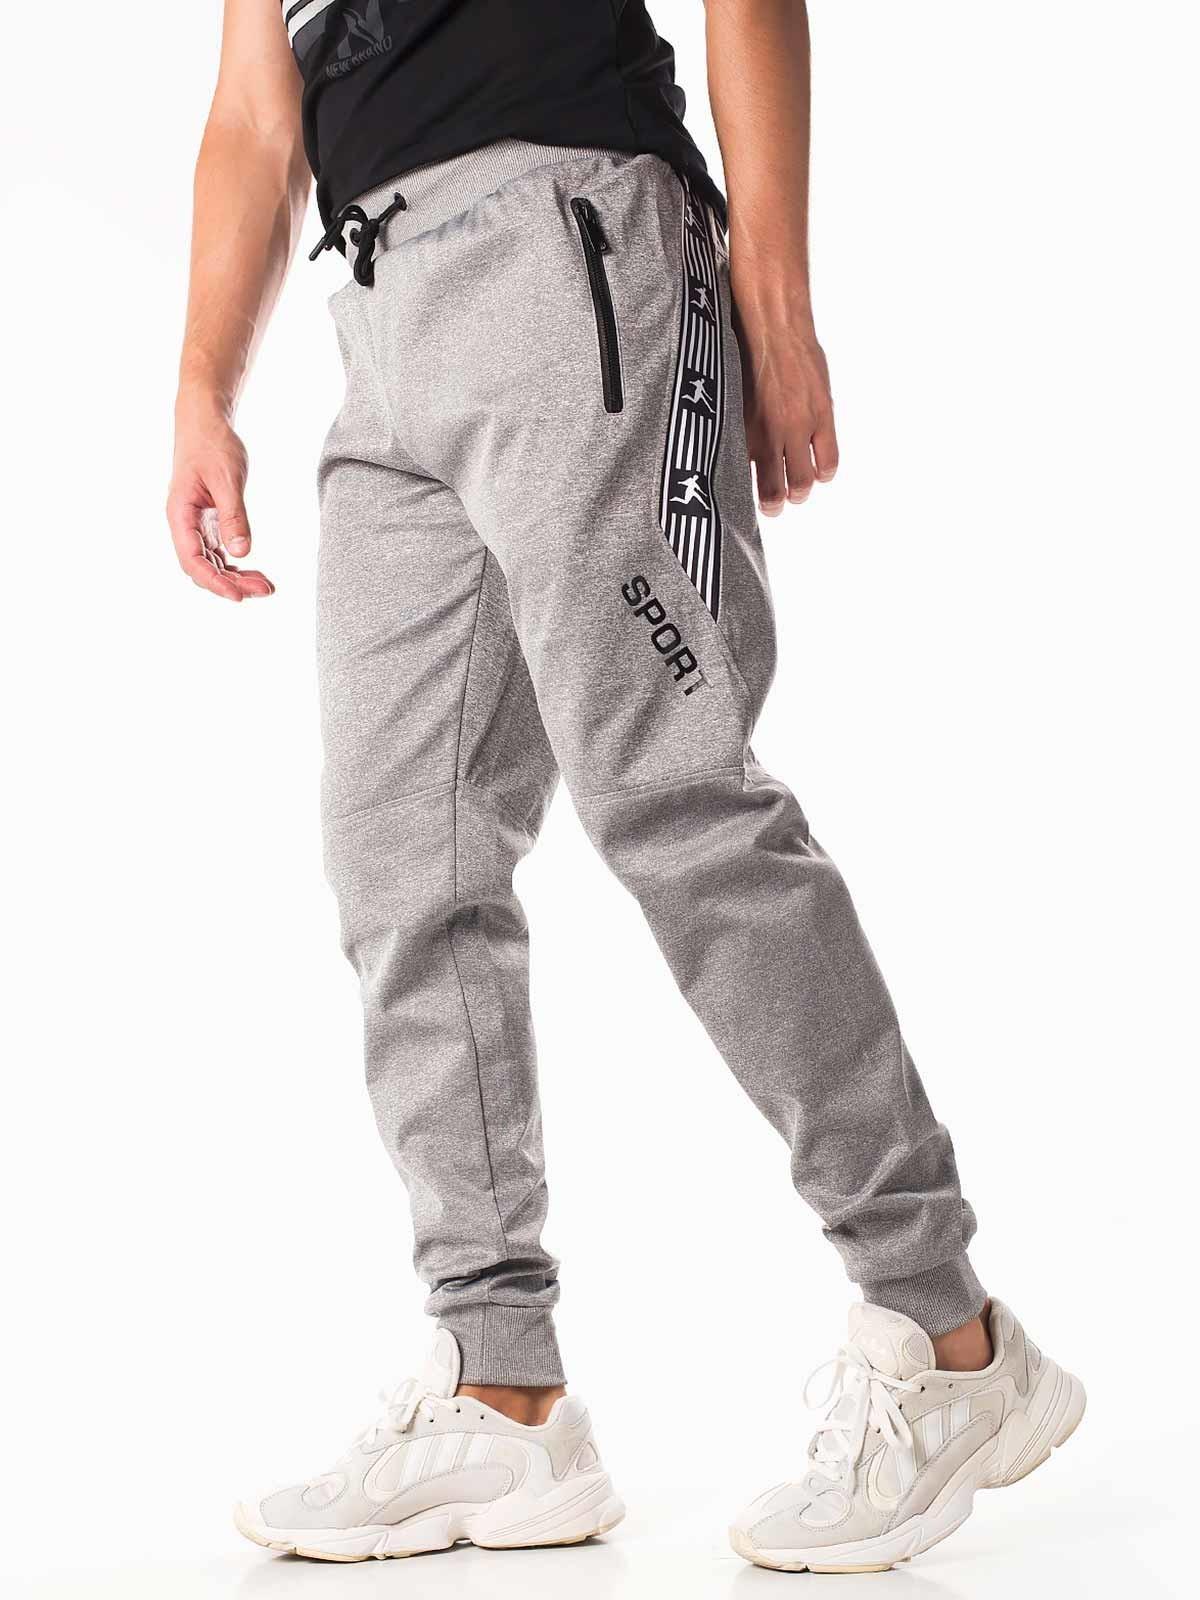 Pantalones deportivos hombre ajustados